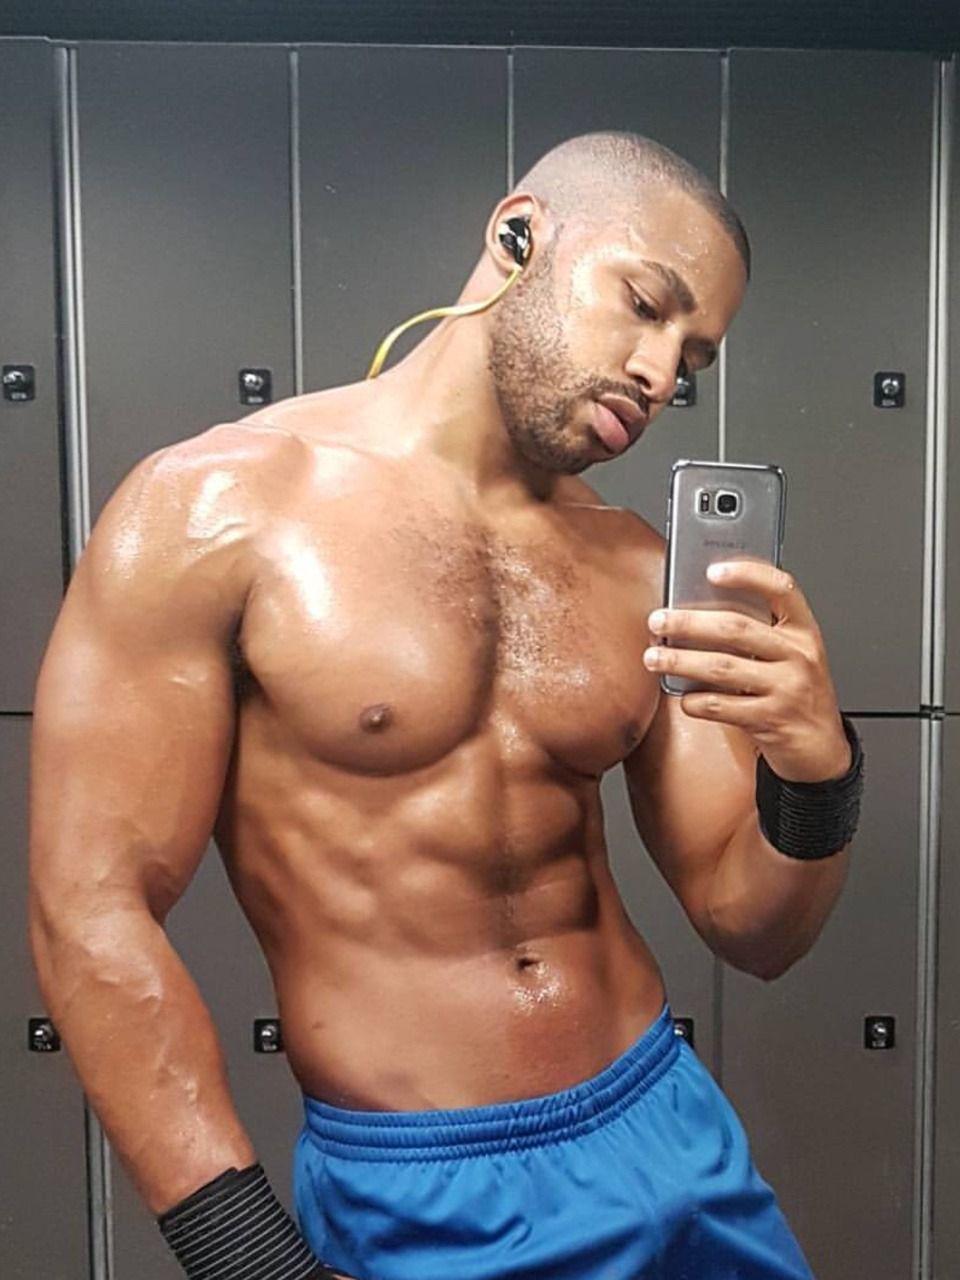 Black men haircuts tumblr pin by a on sexy männersache  pinterest  black man gorgeous